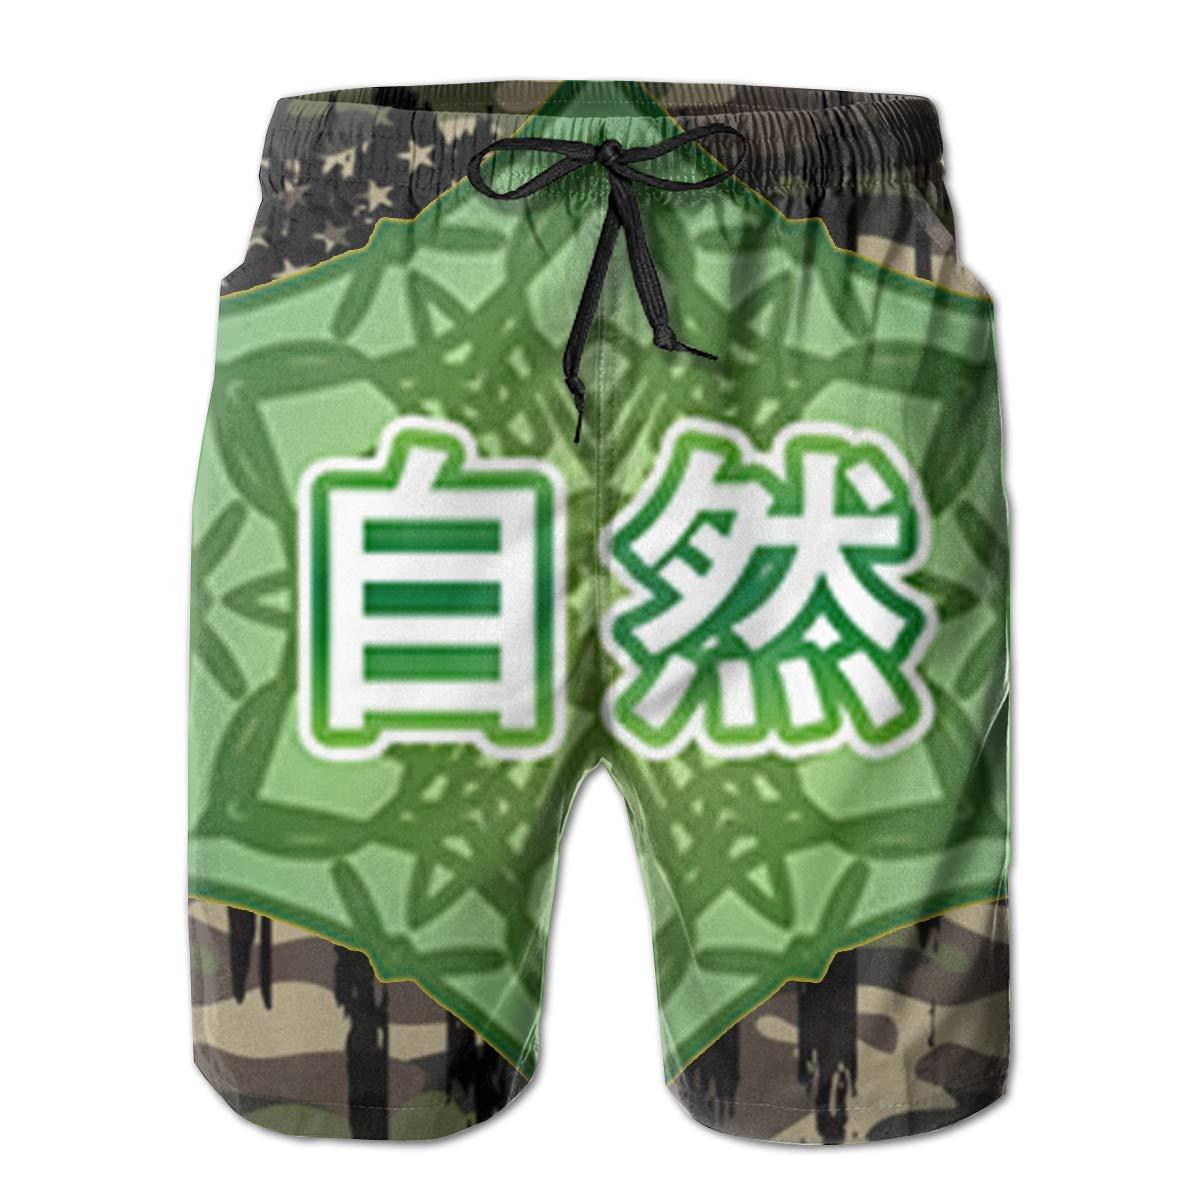 Japanese Nature Mens Swim Trunks Bathing Suit Beach Shorts